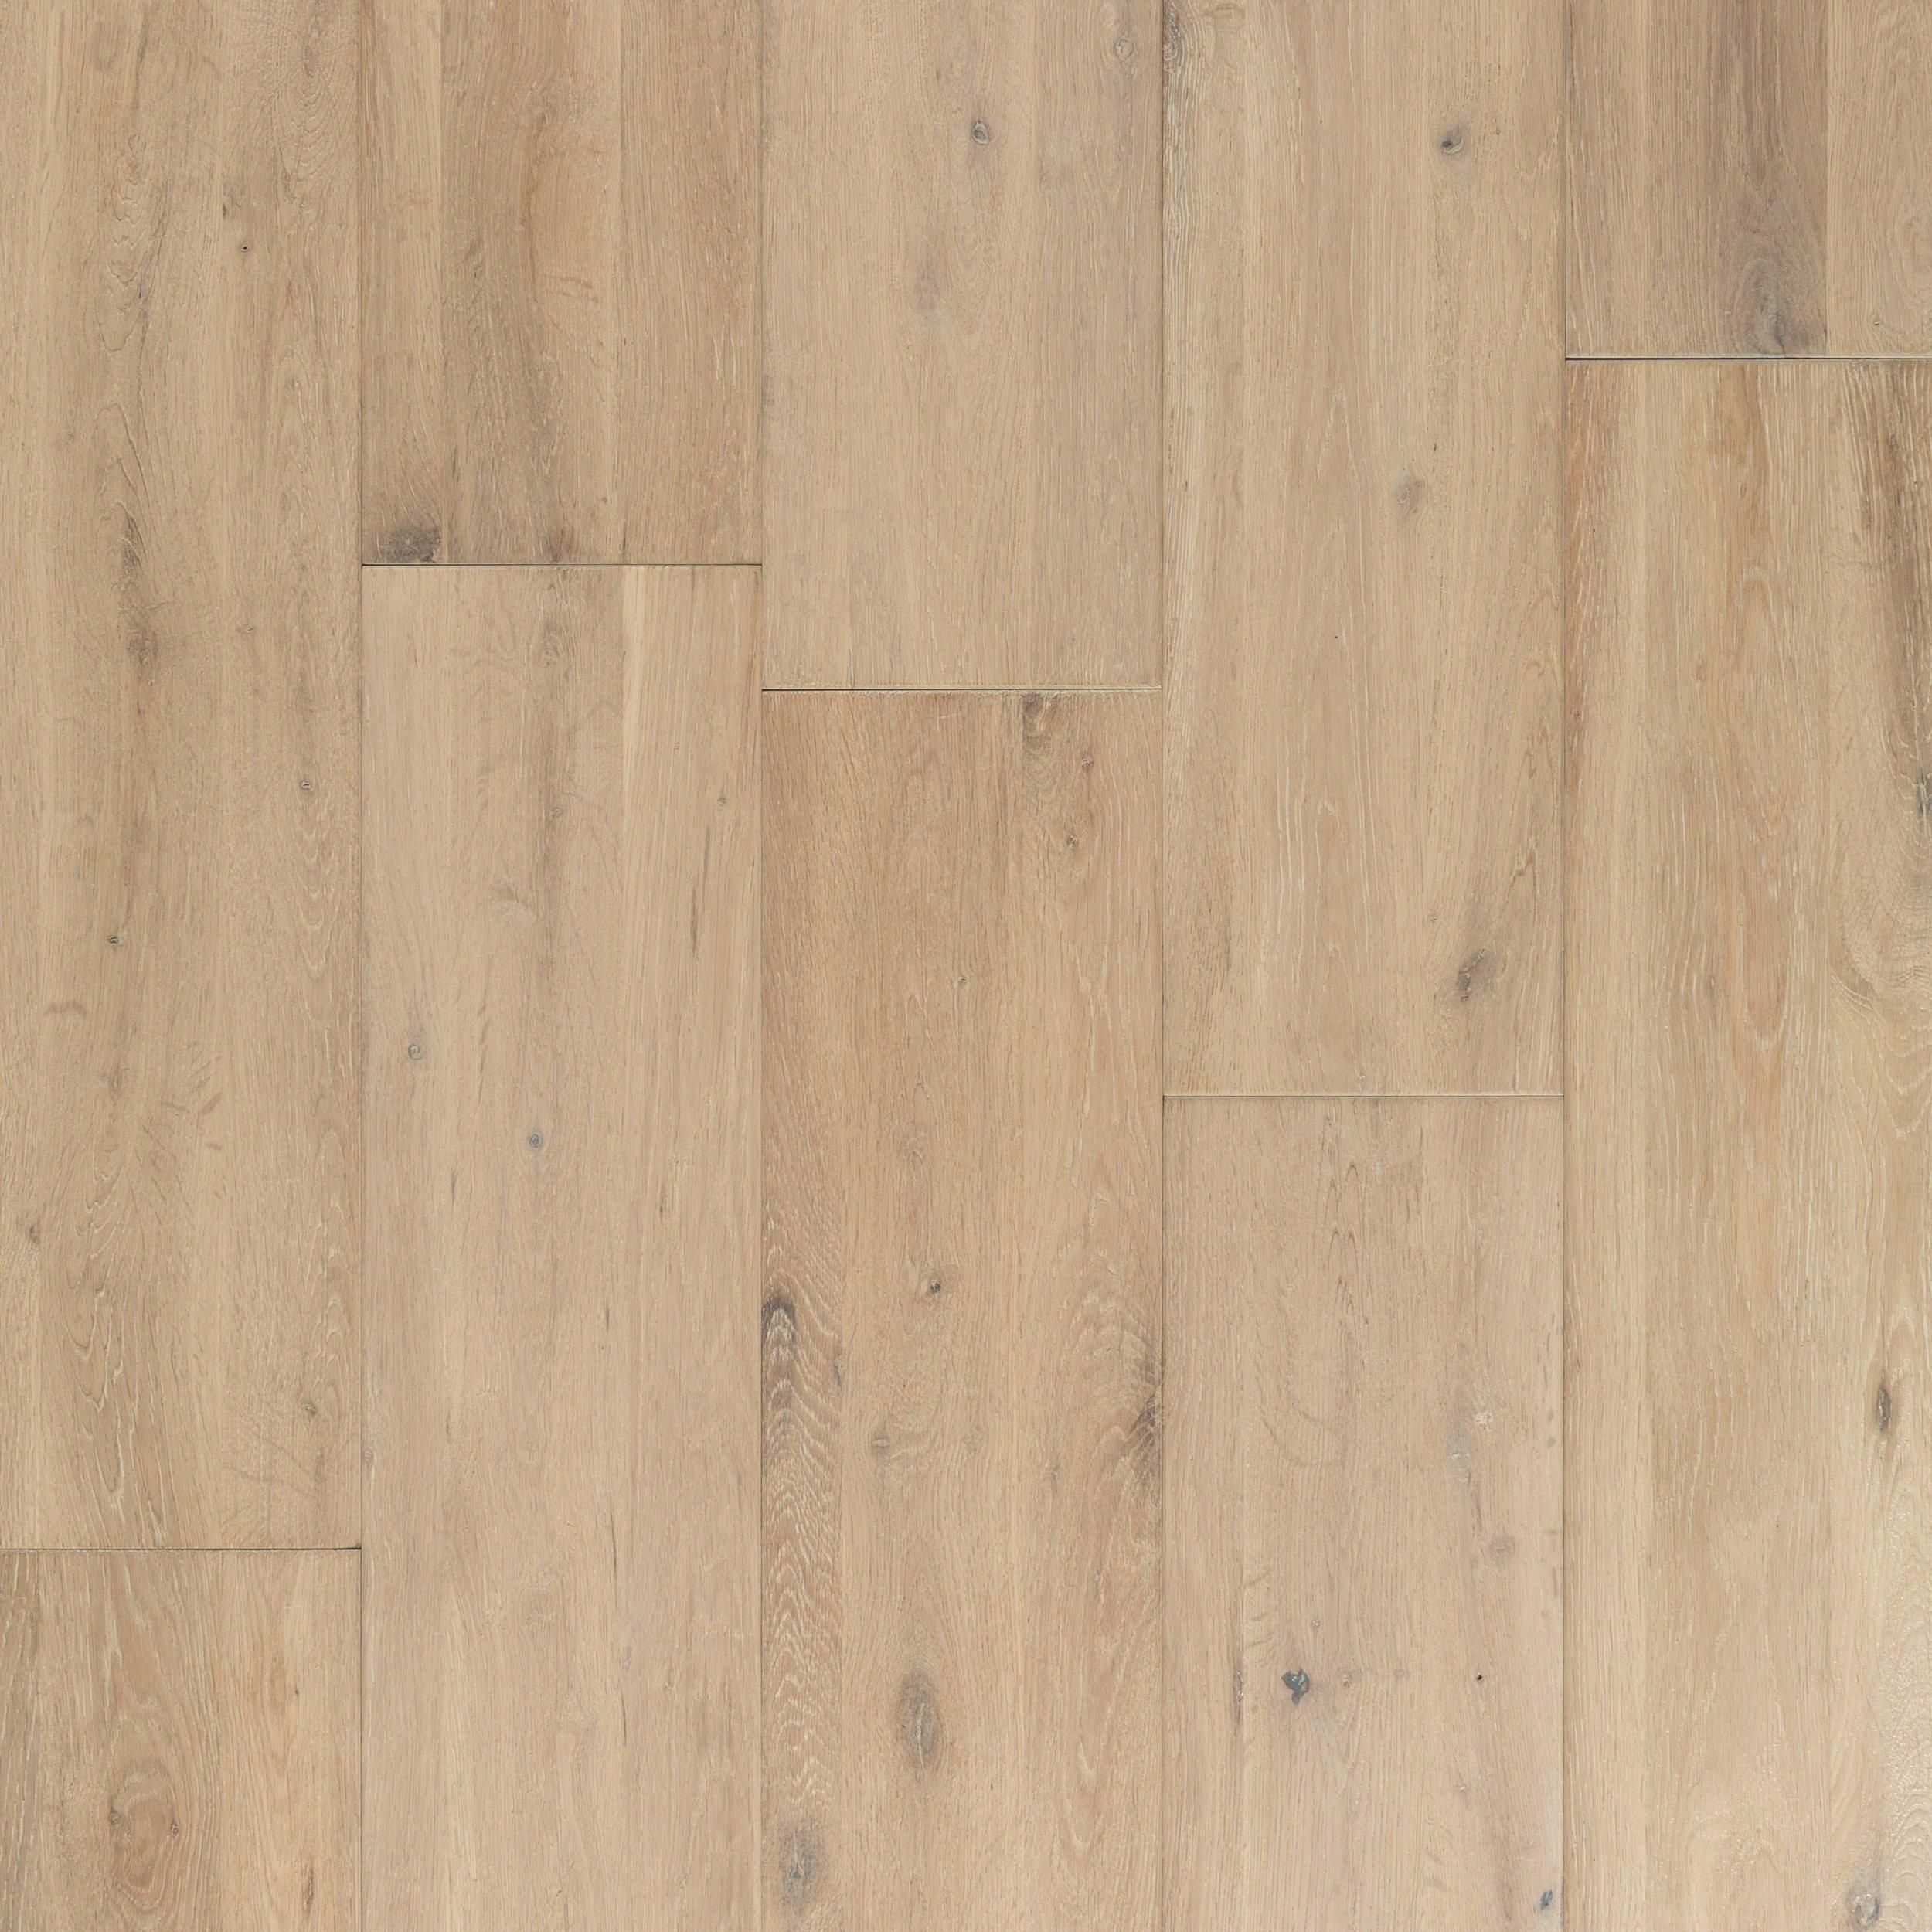 Light Gray Oak Wire Brushed Solid Hardwood Solid Hardwood Floors Light Hardwood Floors Light Oak Floors